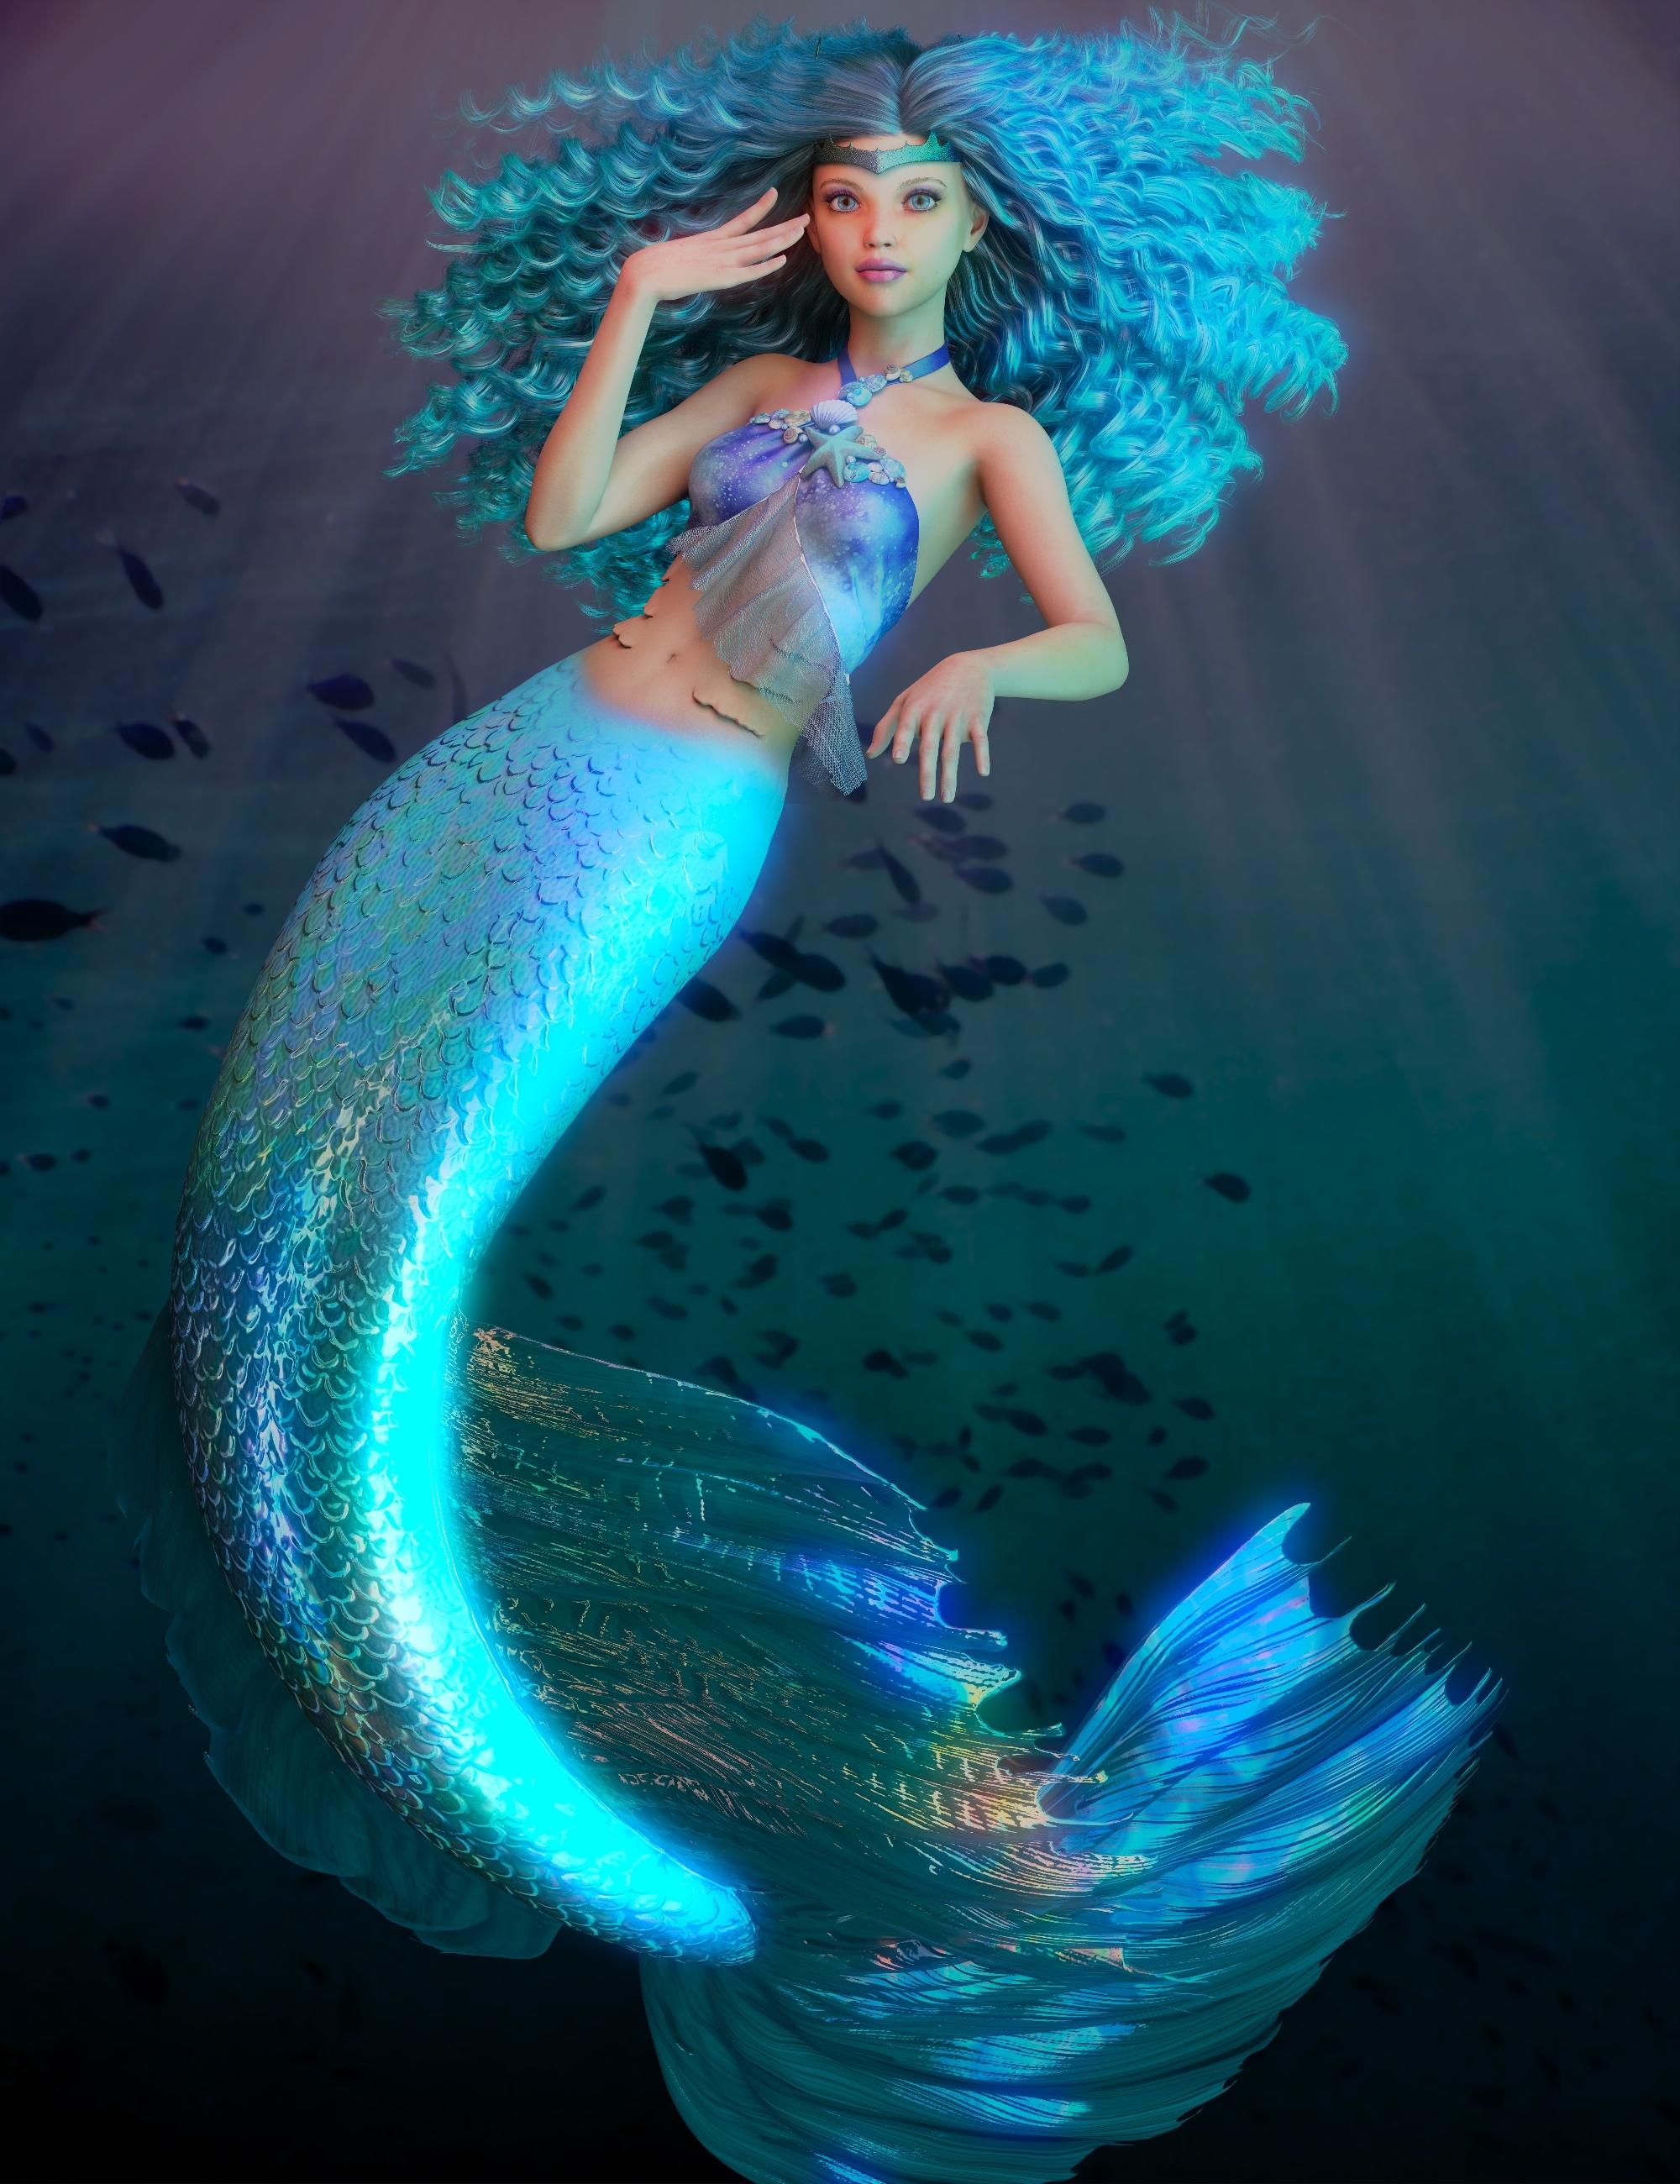 Thalia for Coral 8.1 by: Handspan StudiosChangelingChick, 3D Models by Daz 3D